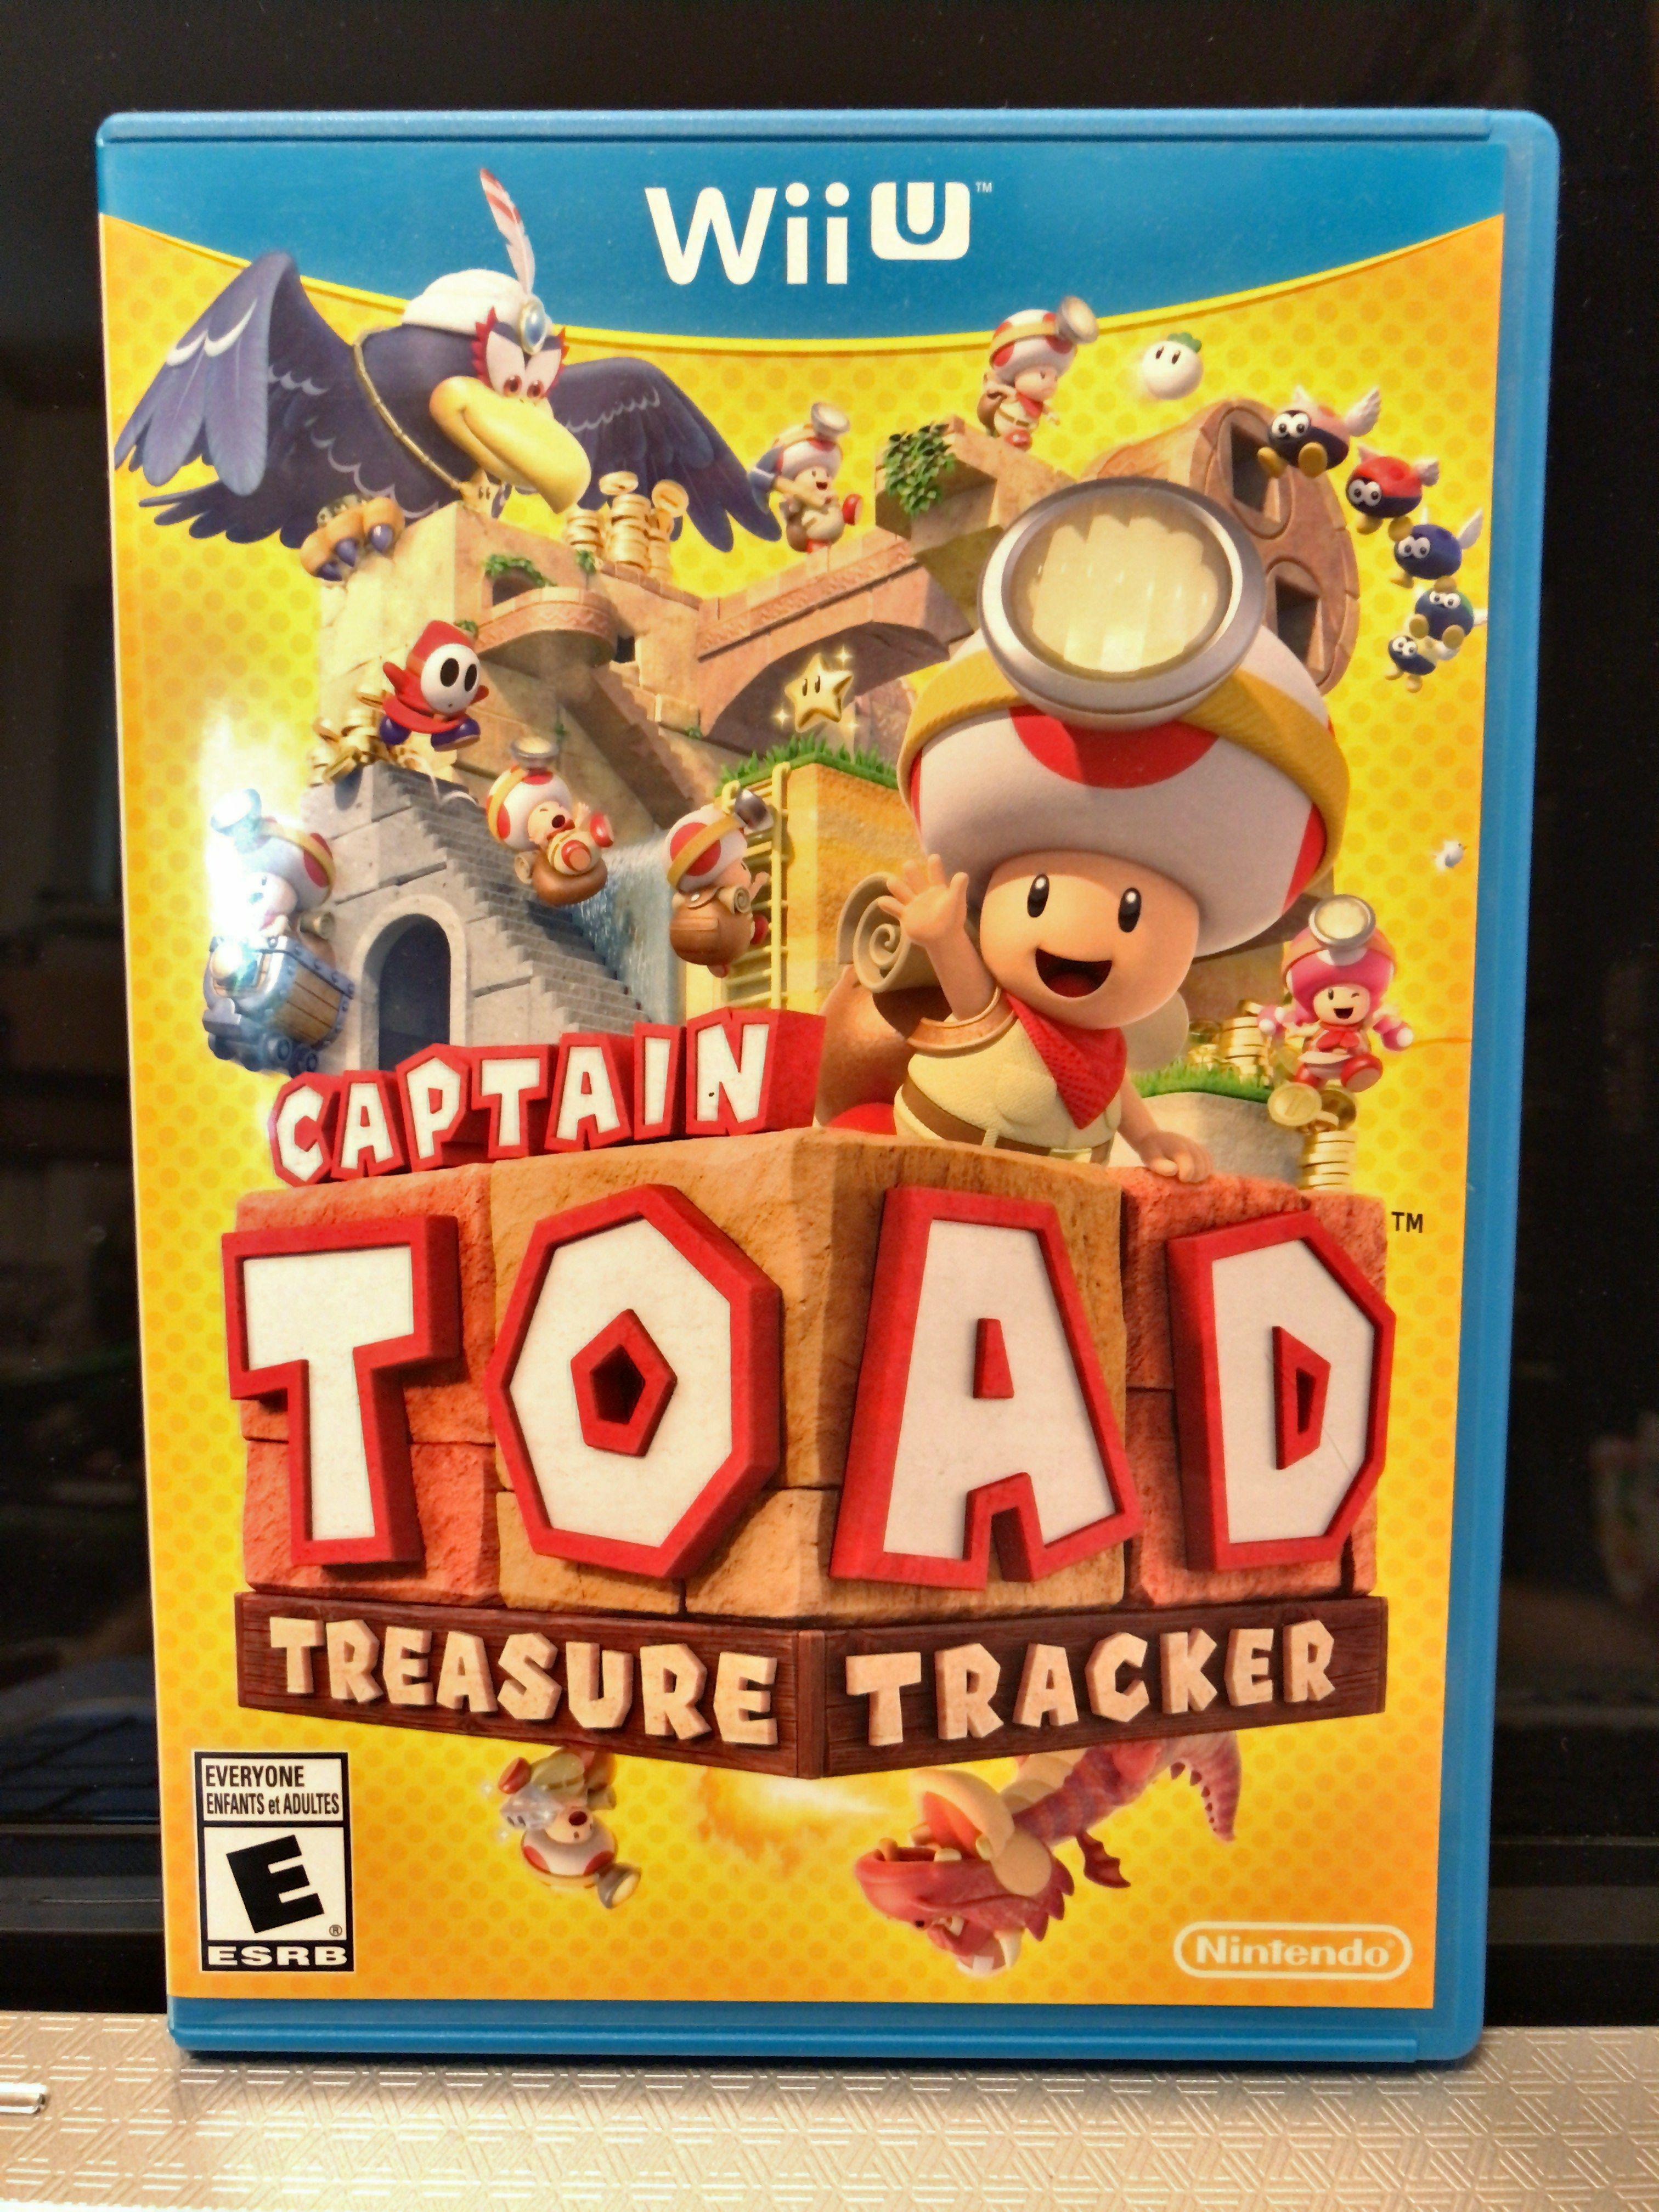 Nintendo Wii U Captain toad treasure tracker